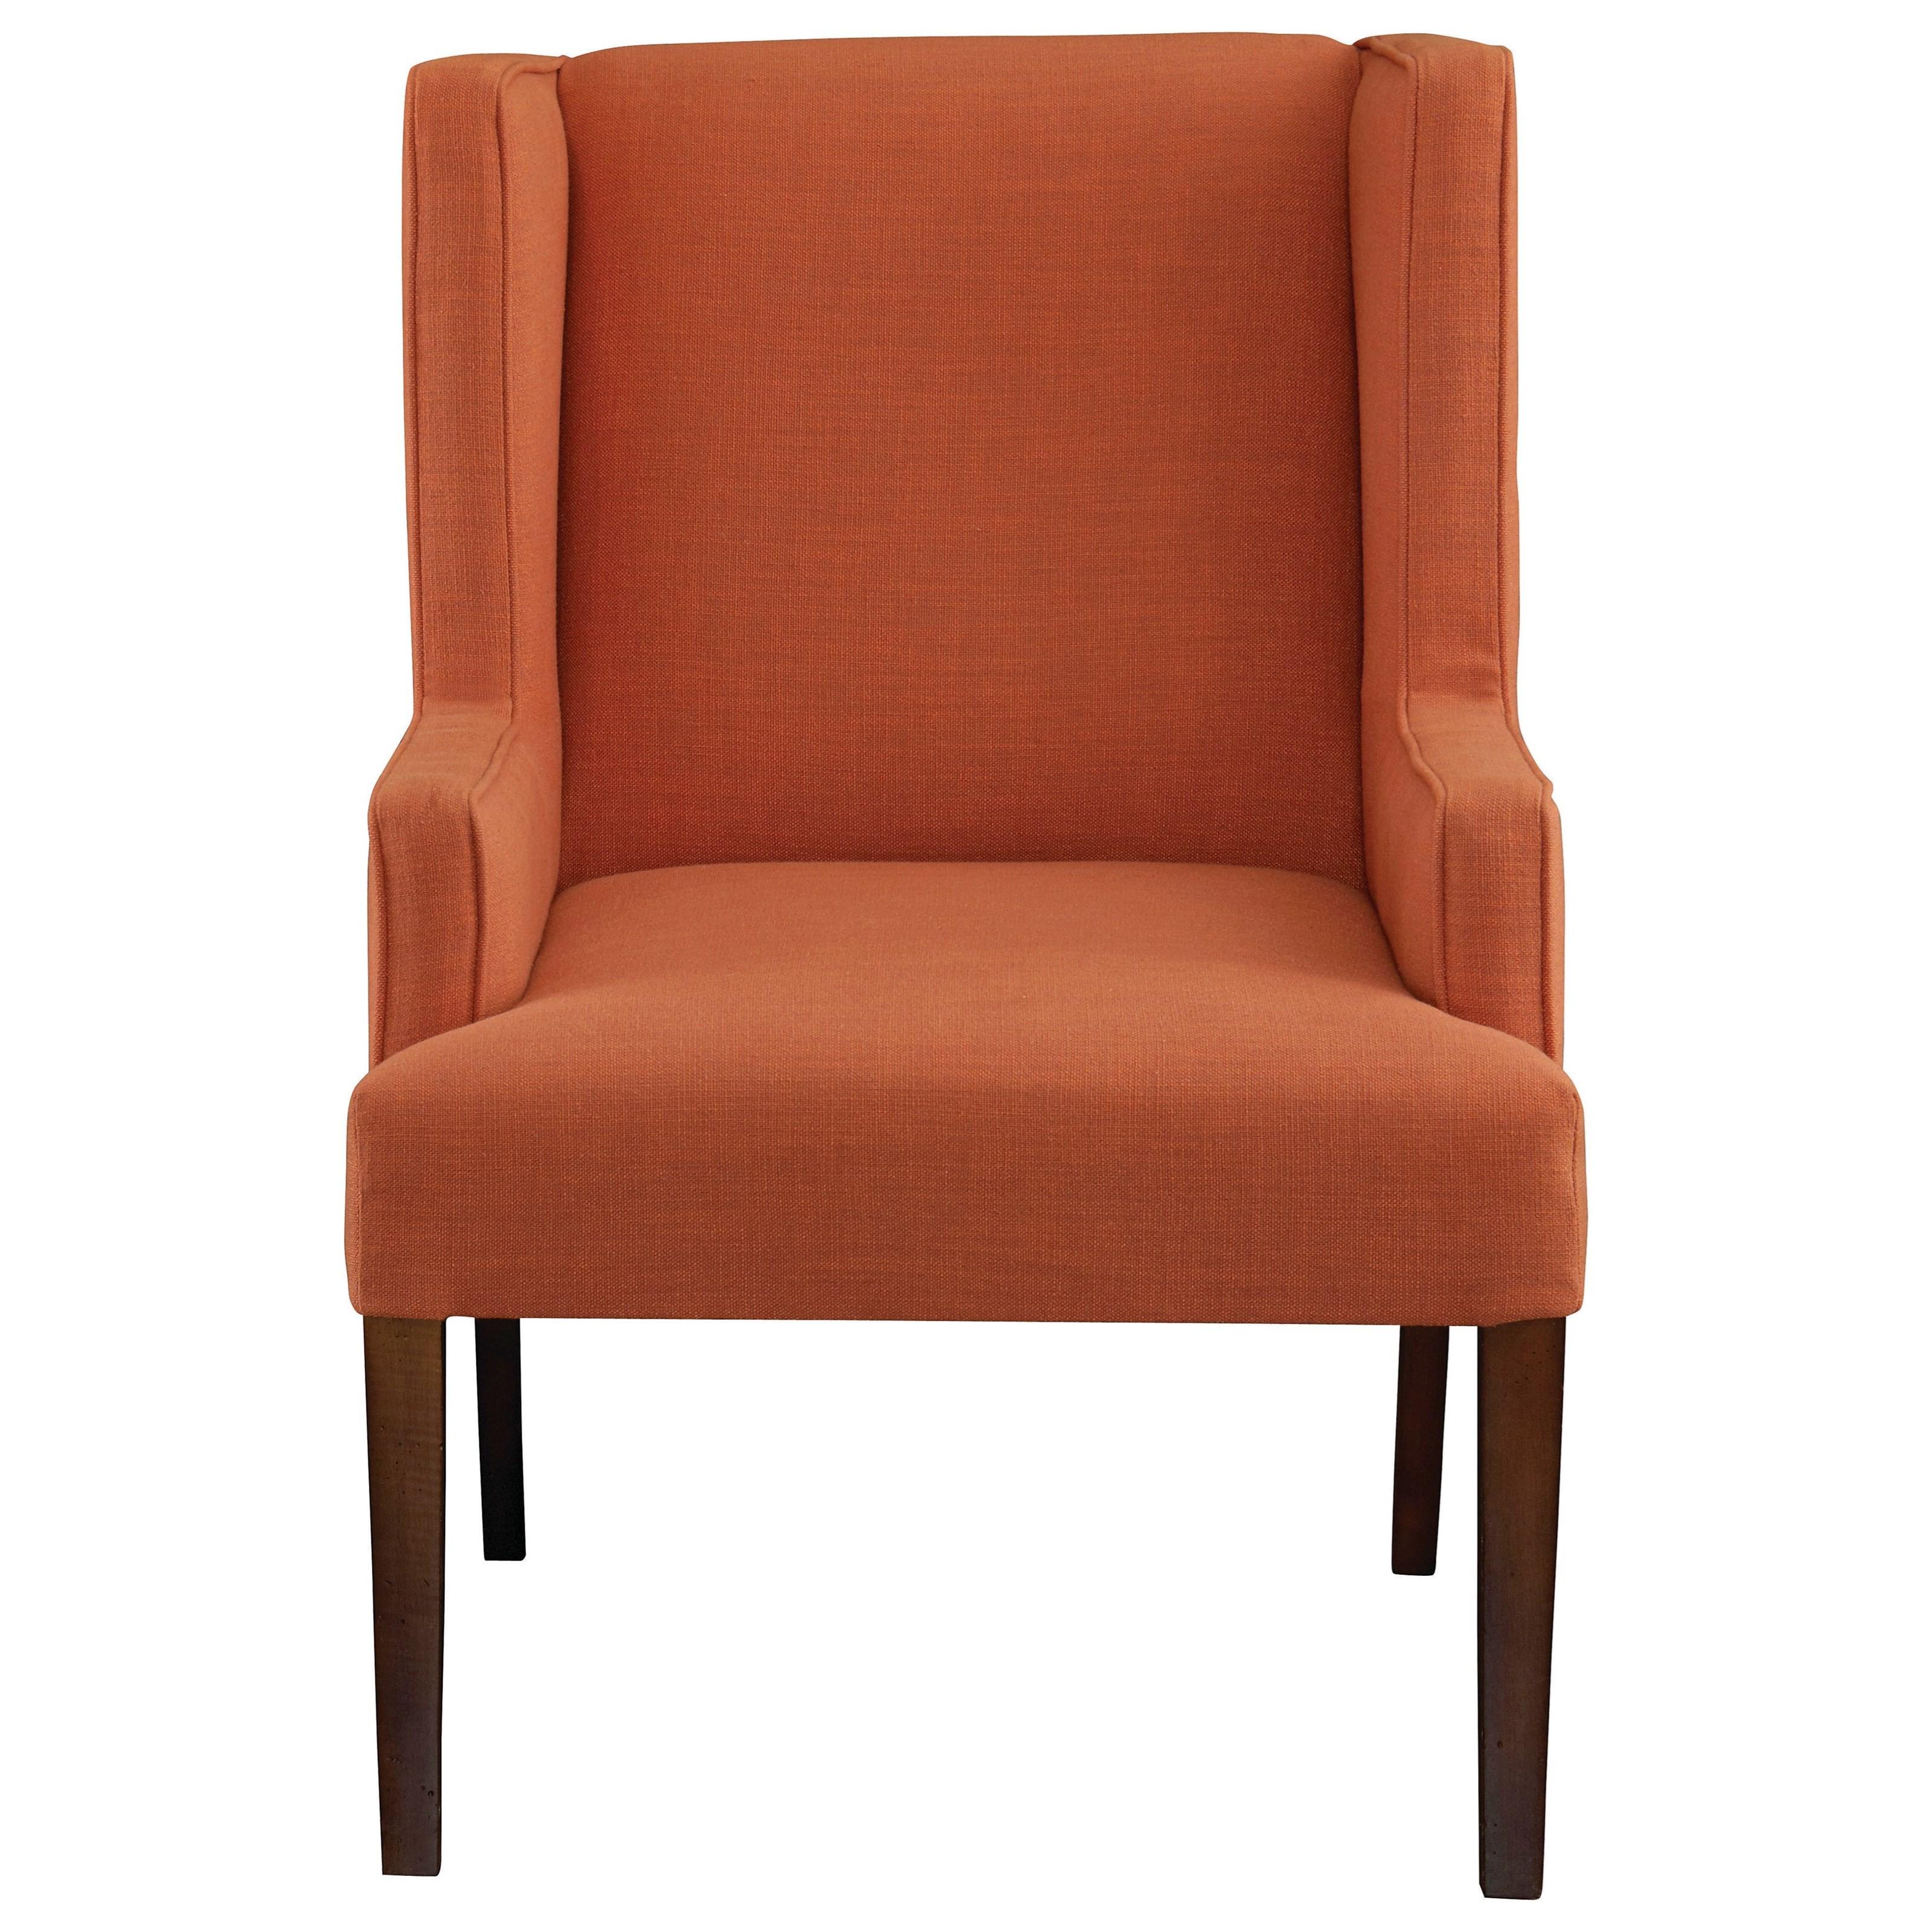 Albert Arm Chair by Bassett at Bassett of Cool Springs